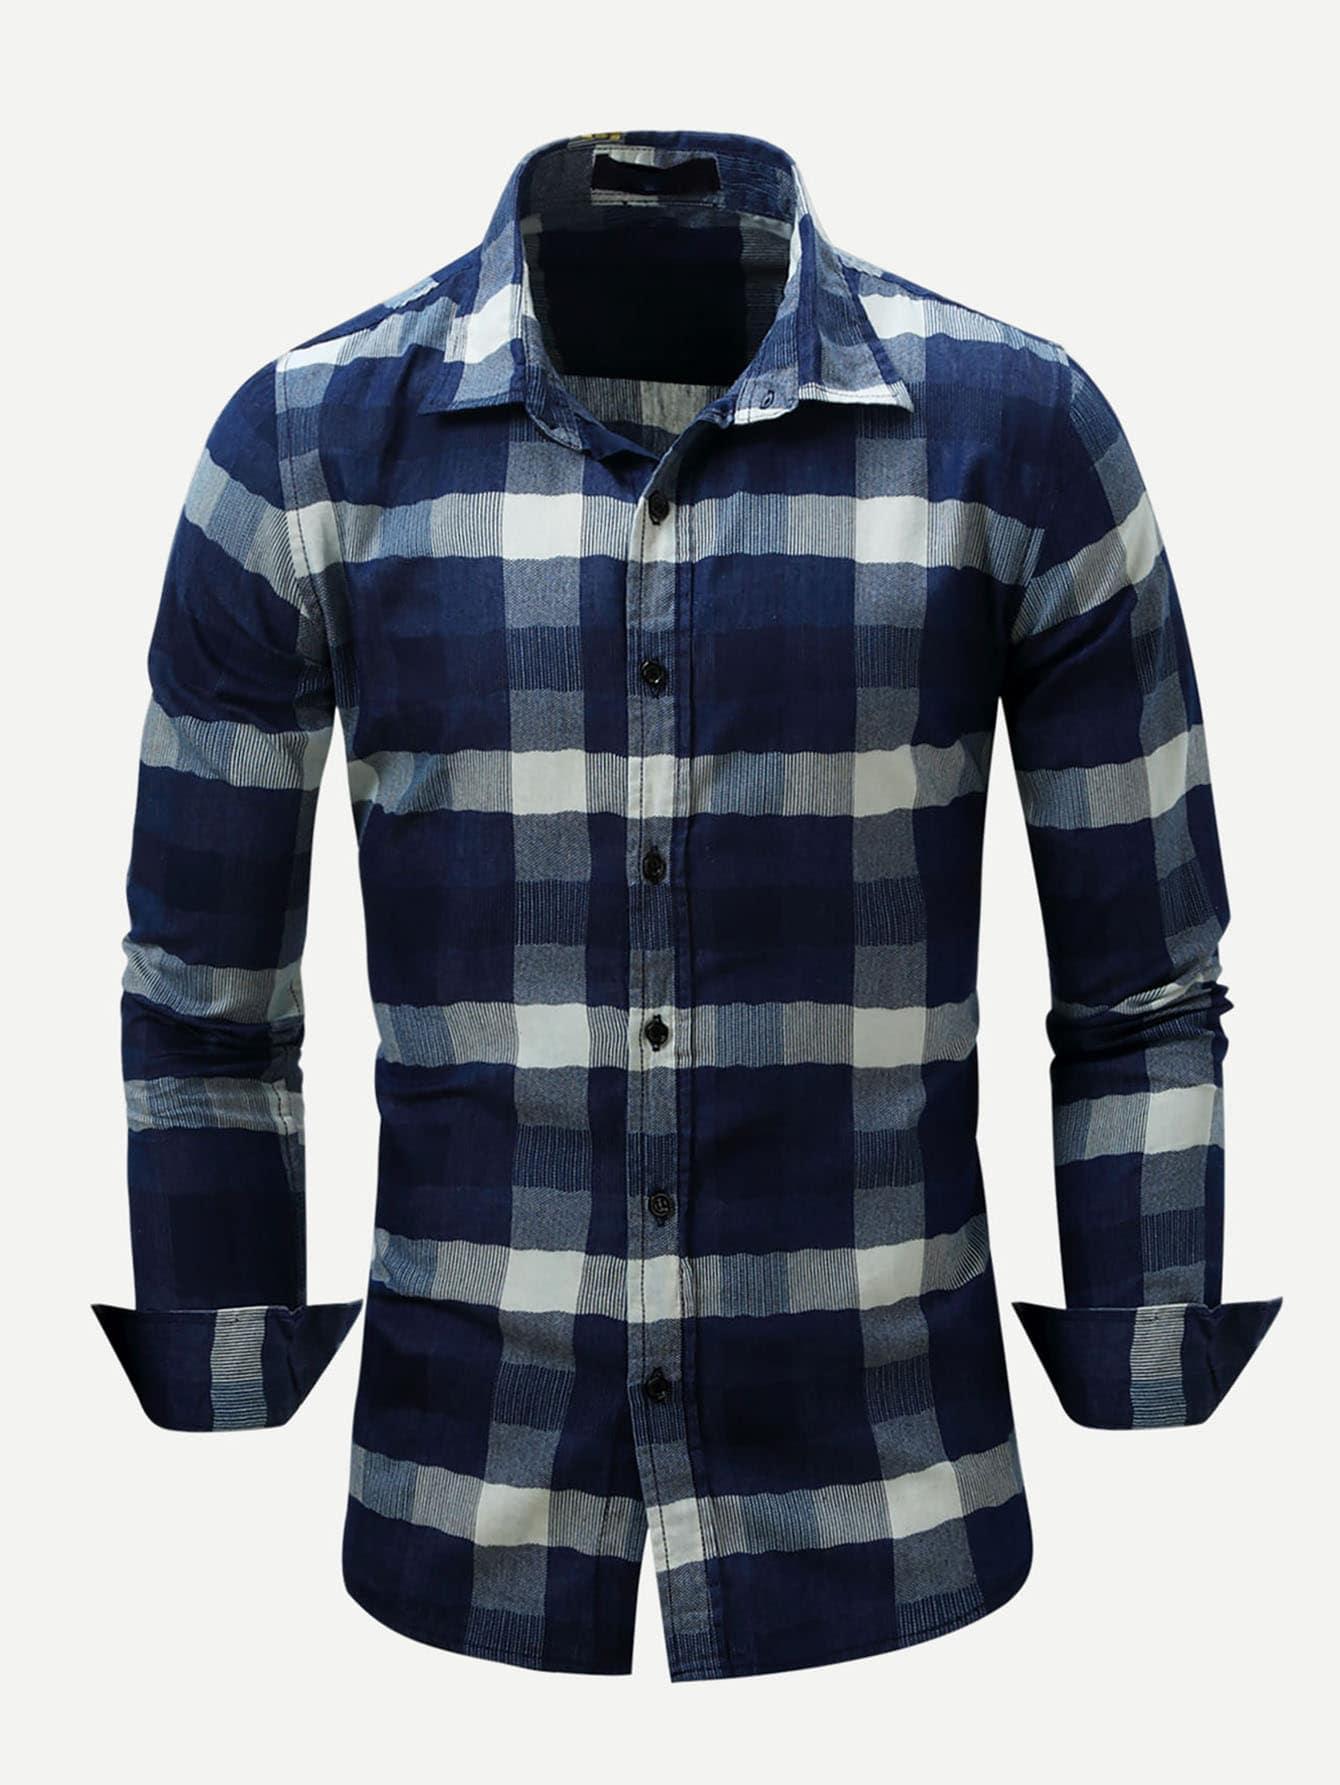 Men Plaid Denim Shirt Men Plaid Denim Shirt